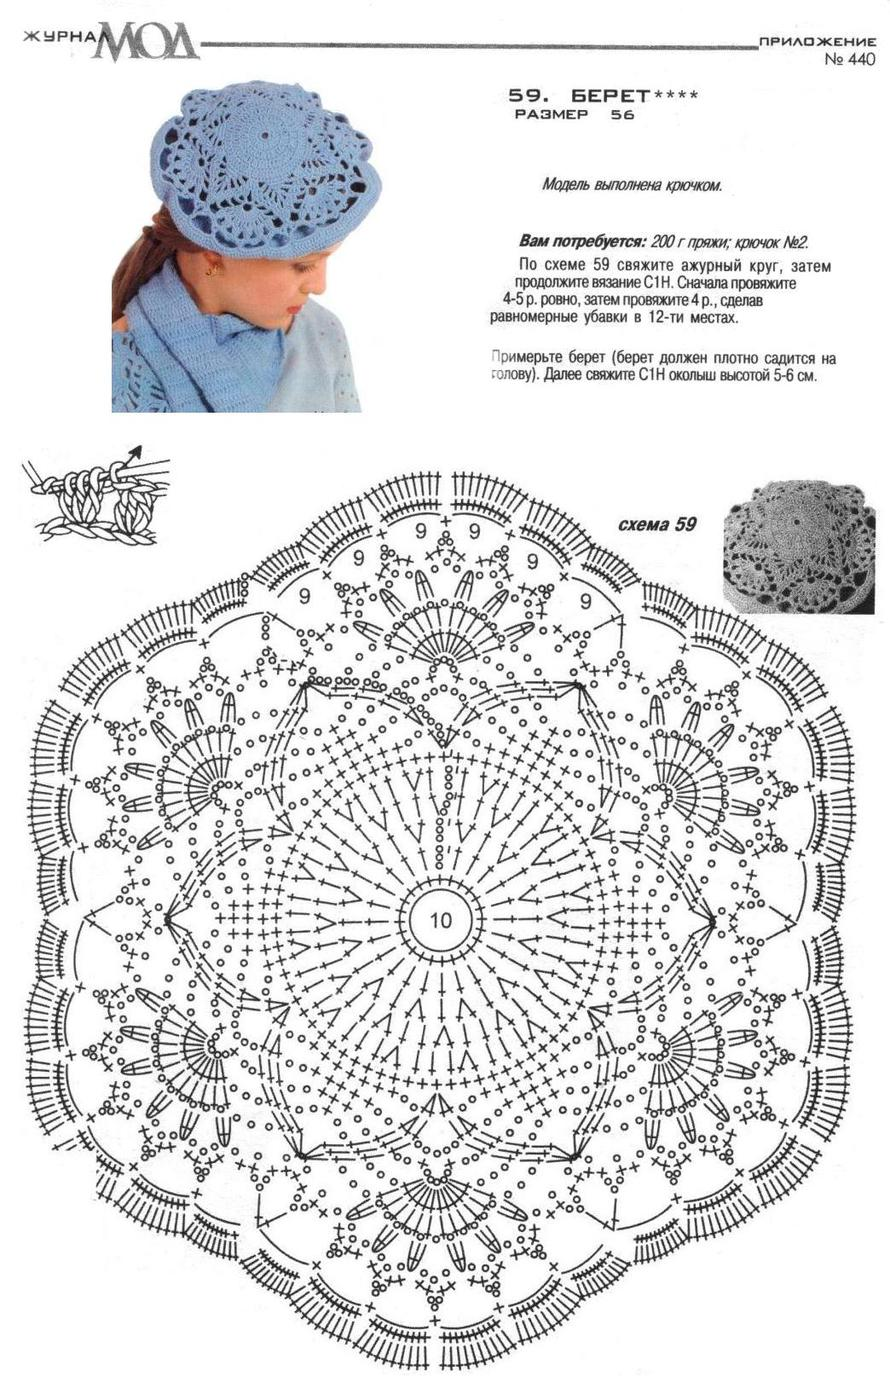 Схема фото берета связанного крючком